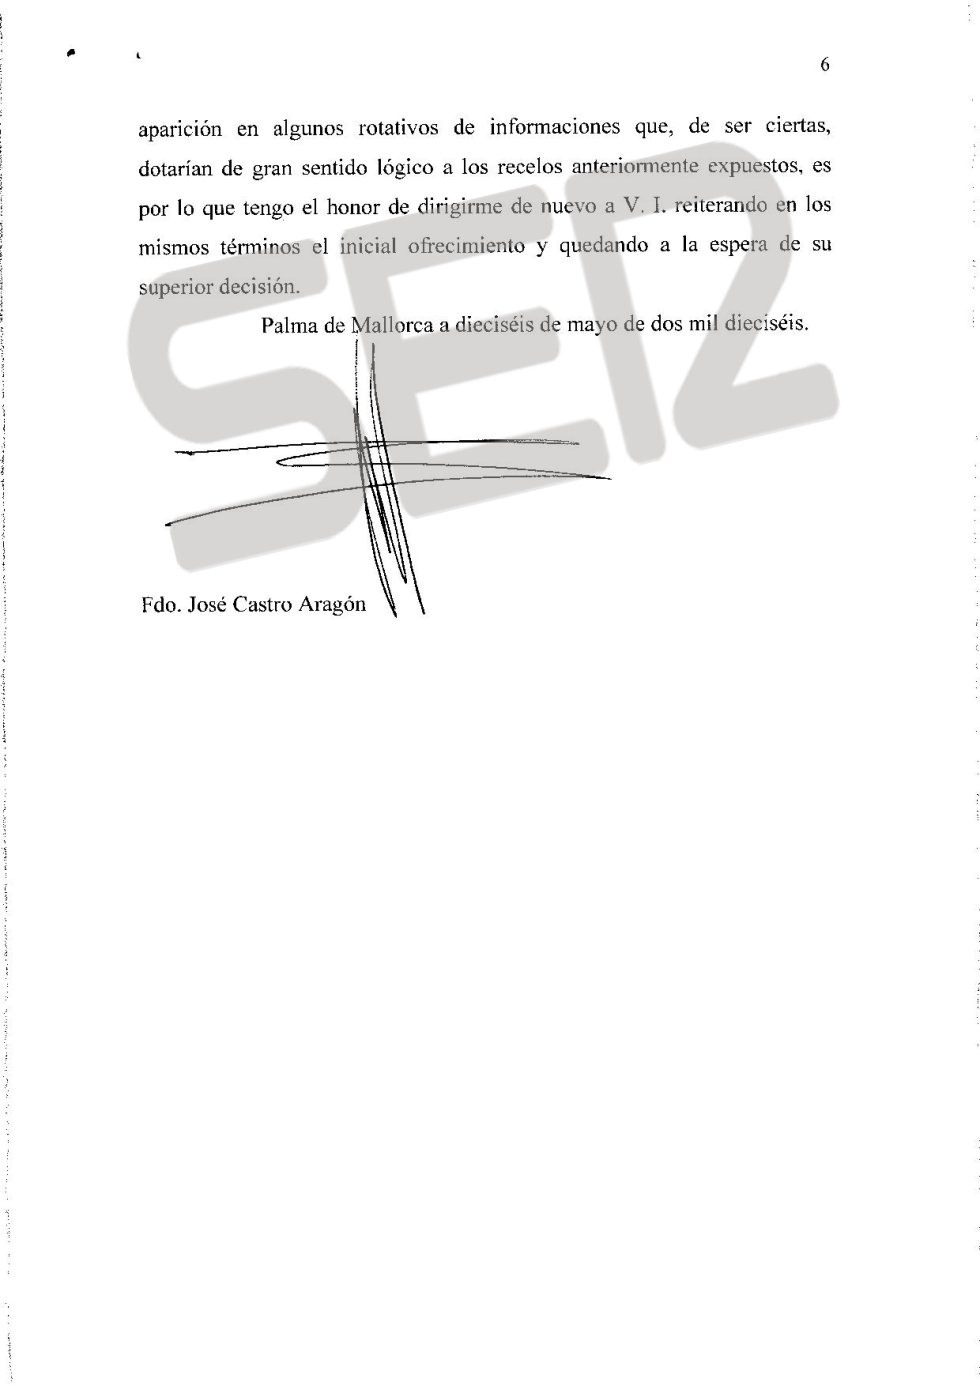 Carta íntegra de José Castro a Santiago Pedraz (página 6/6).